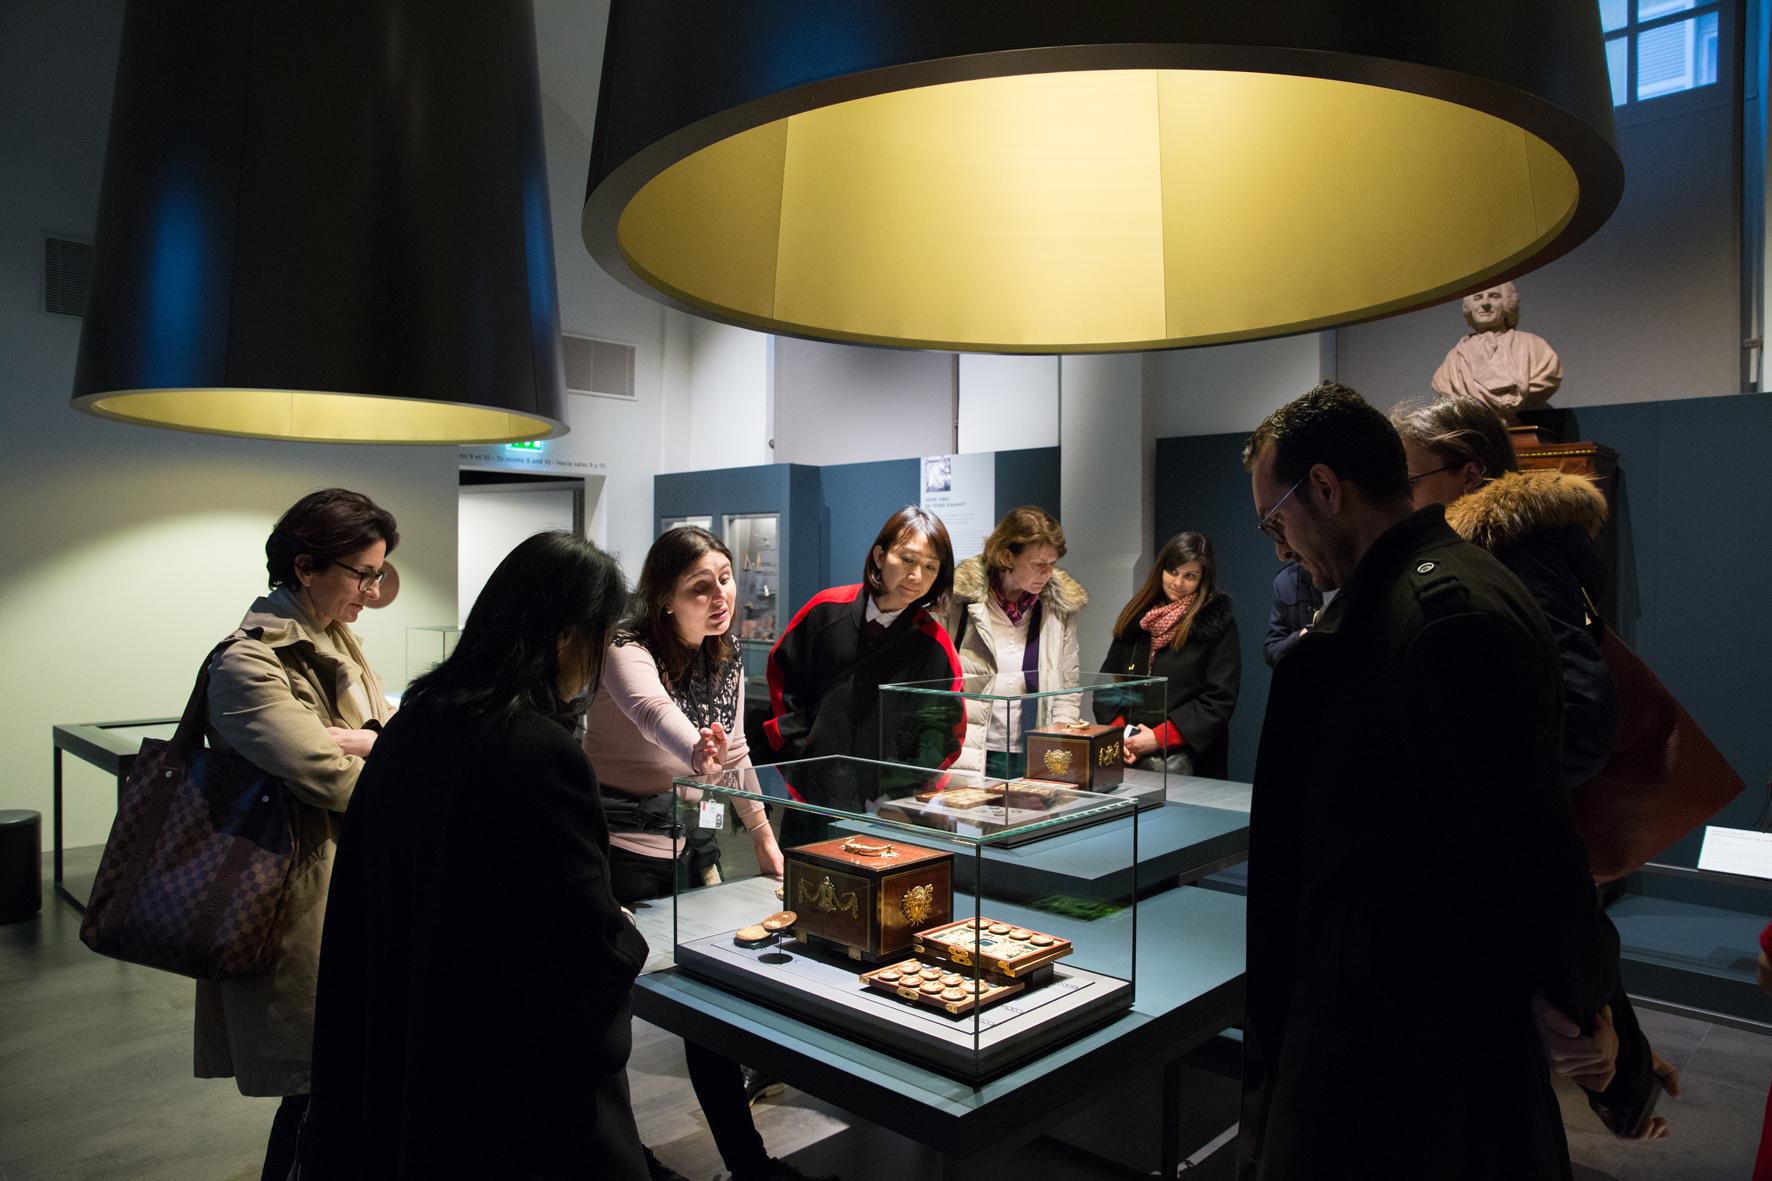 IMG_6803 SAP CONCUR VIP EVENT BY RUE AMANDINE.jpg